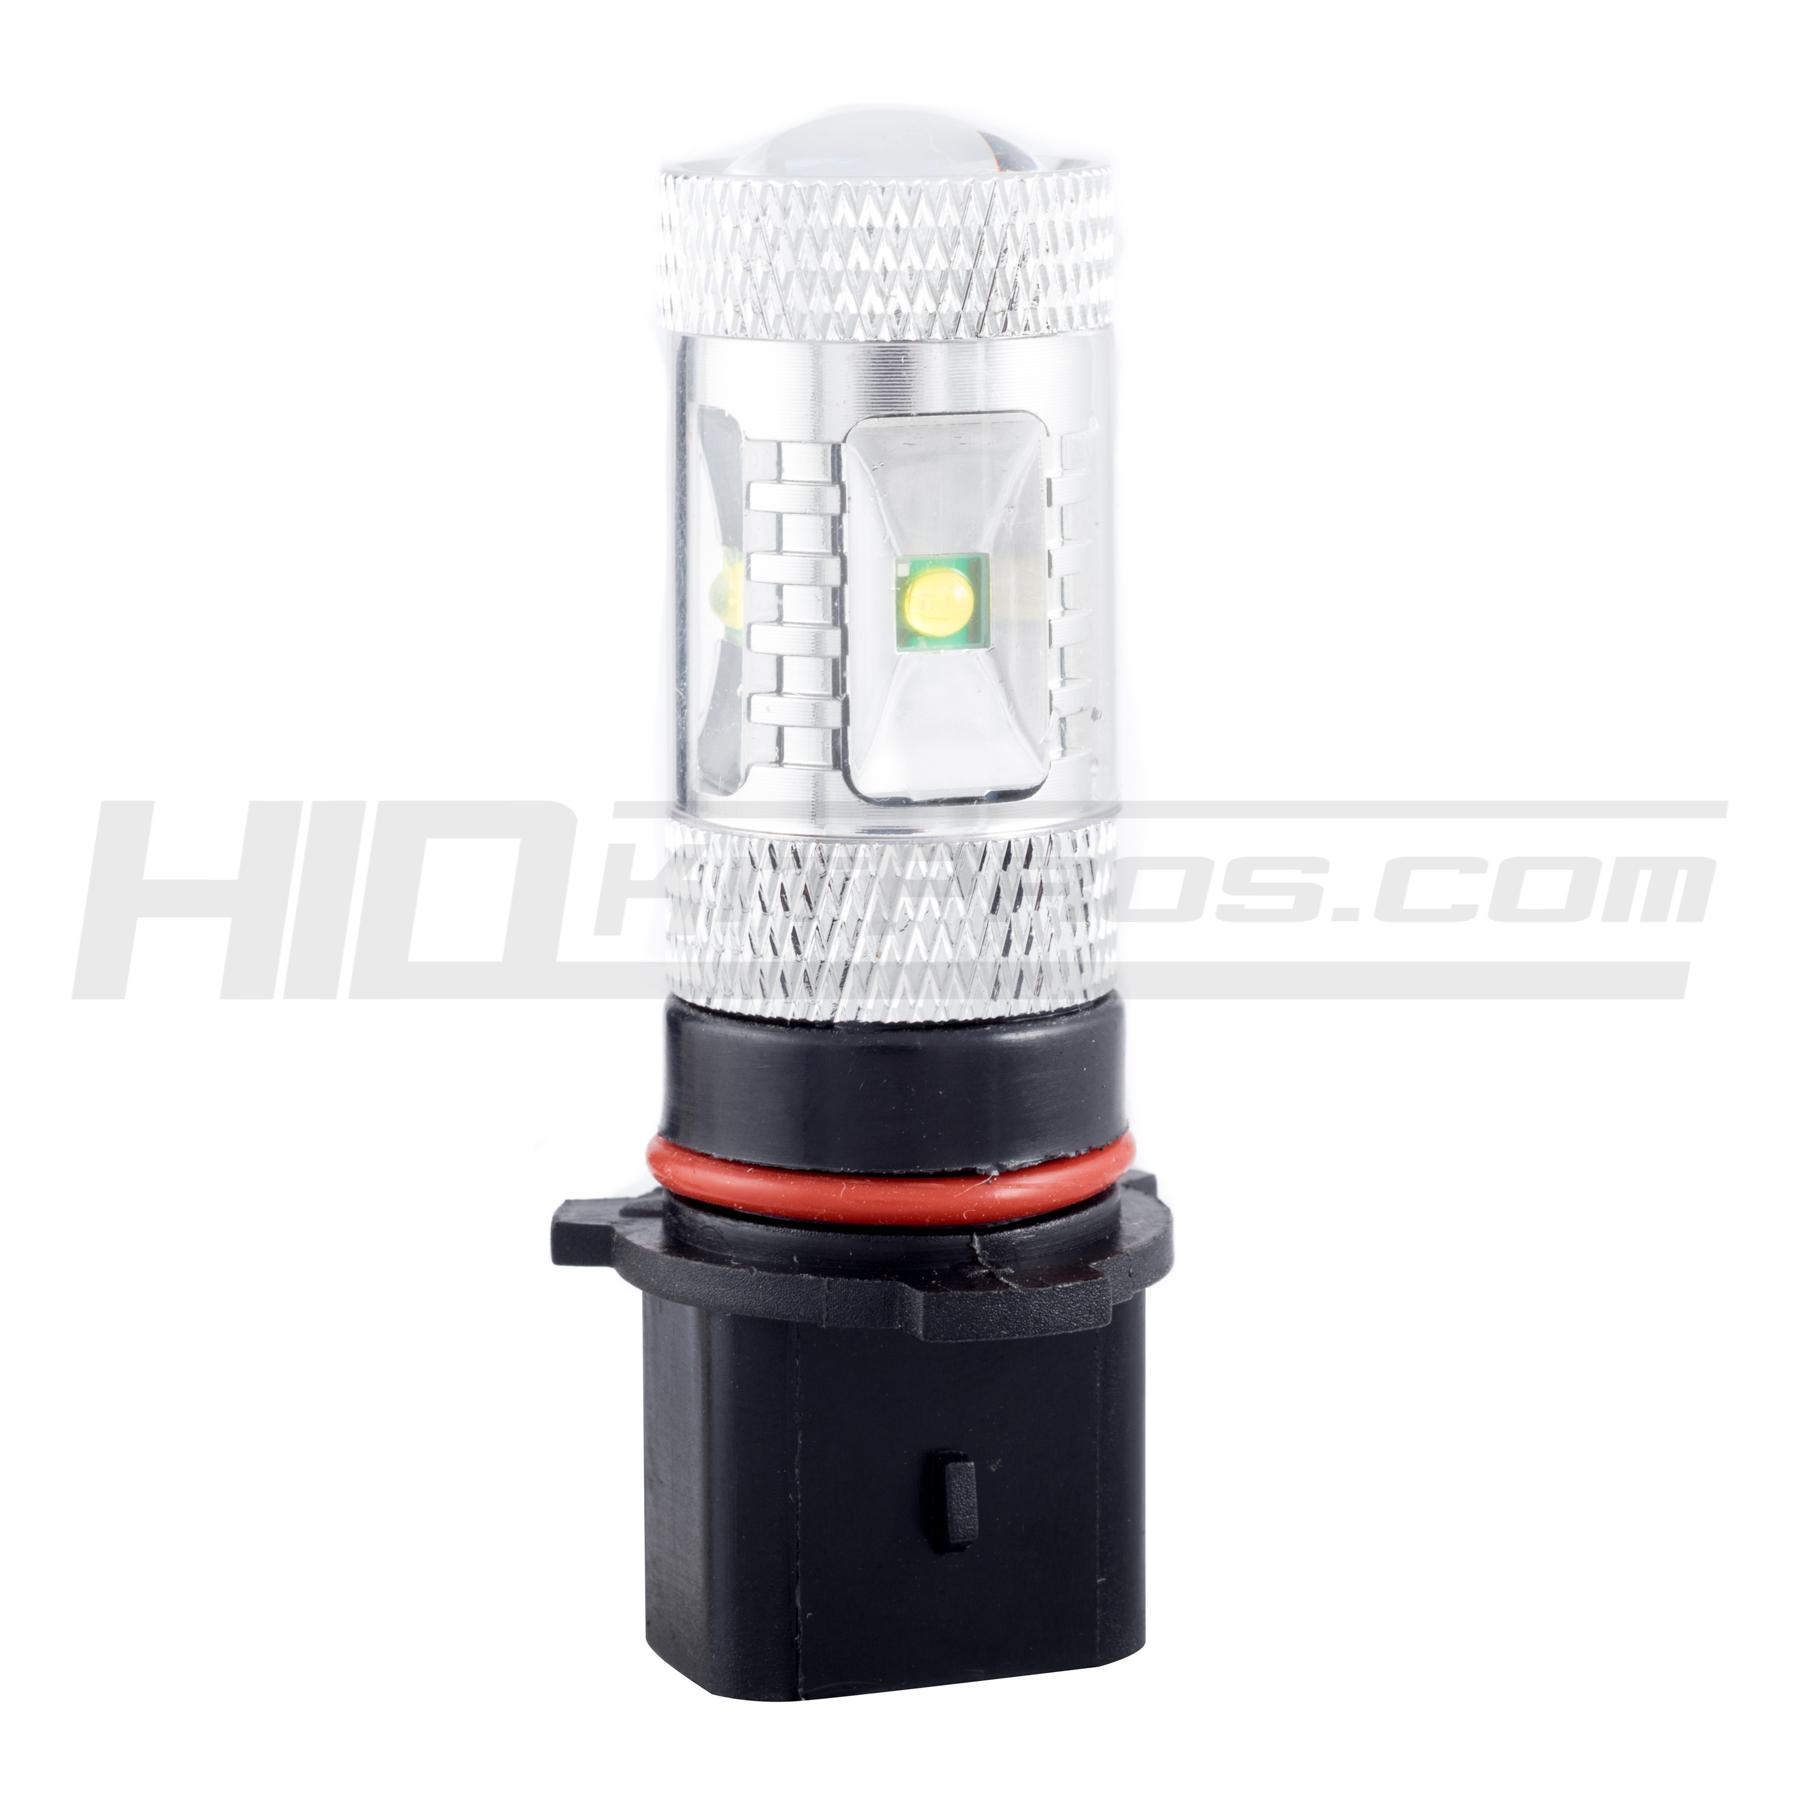 LumaWerx™ PSX26W High Power LED Bulb - LW30 CREE   HID Kit Pros